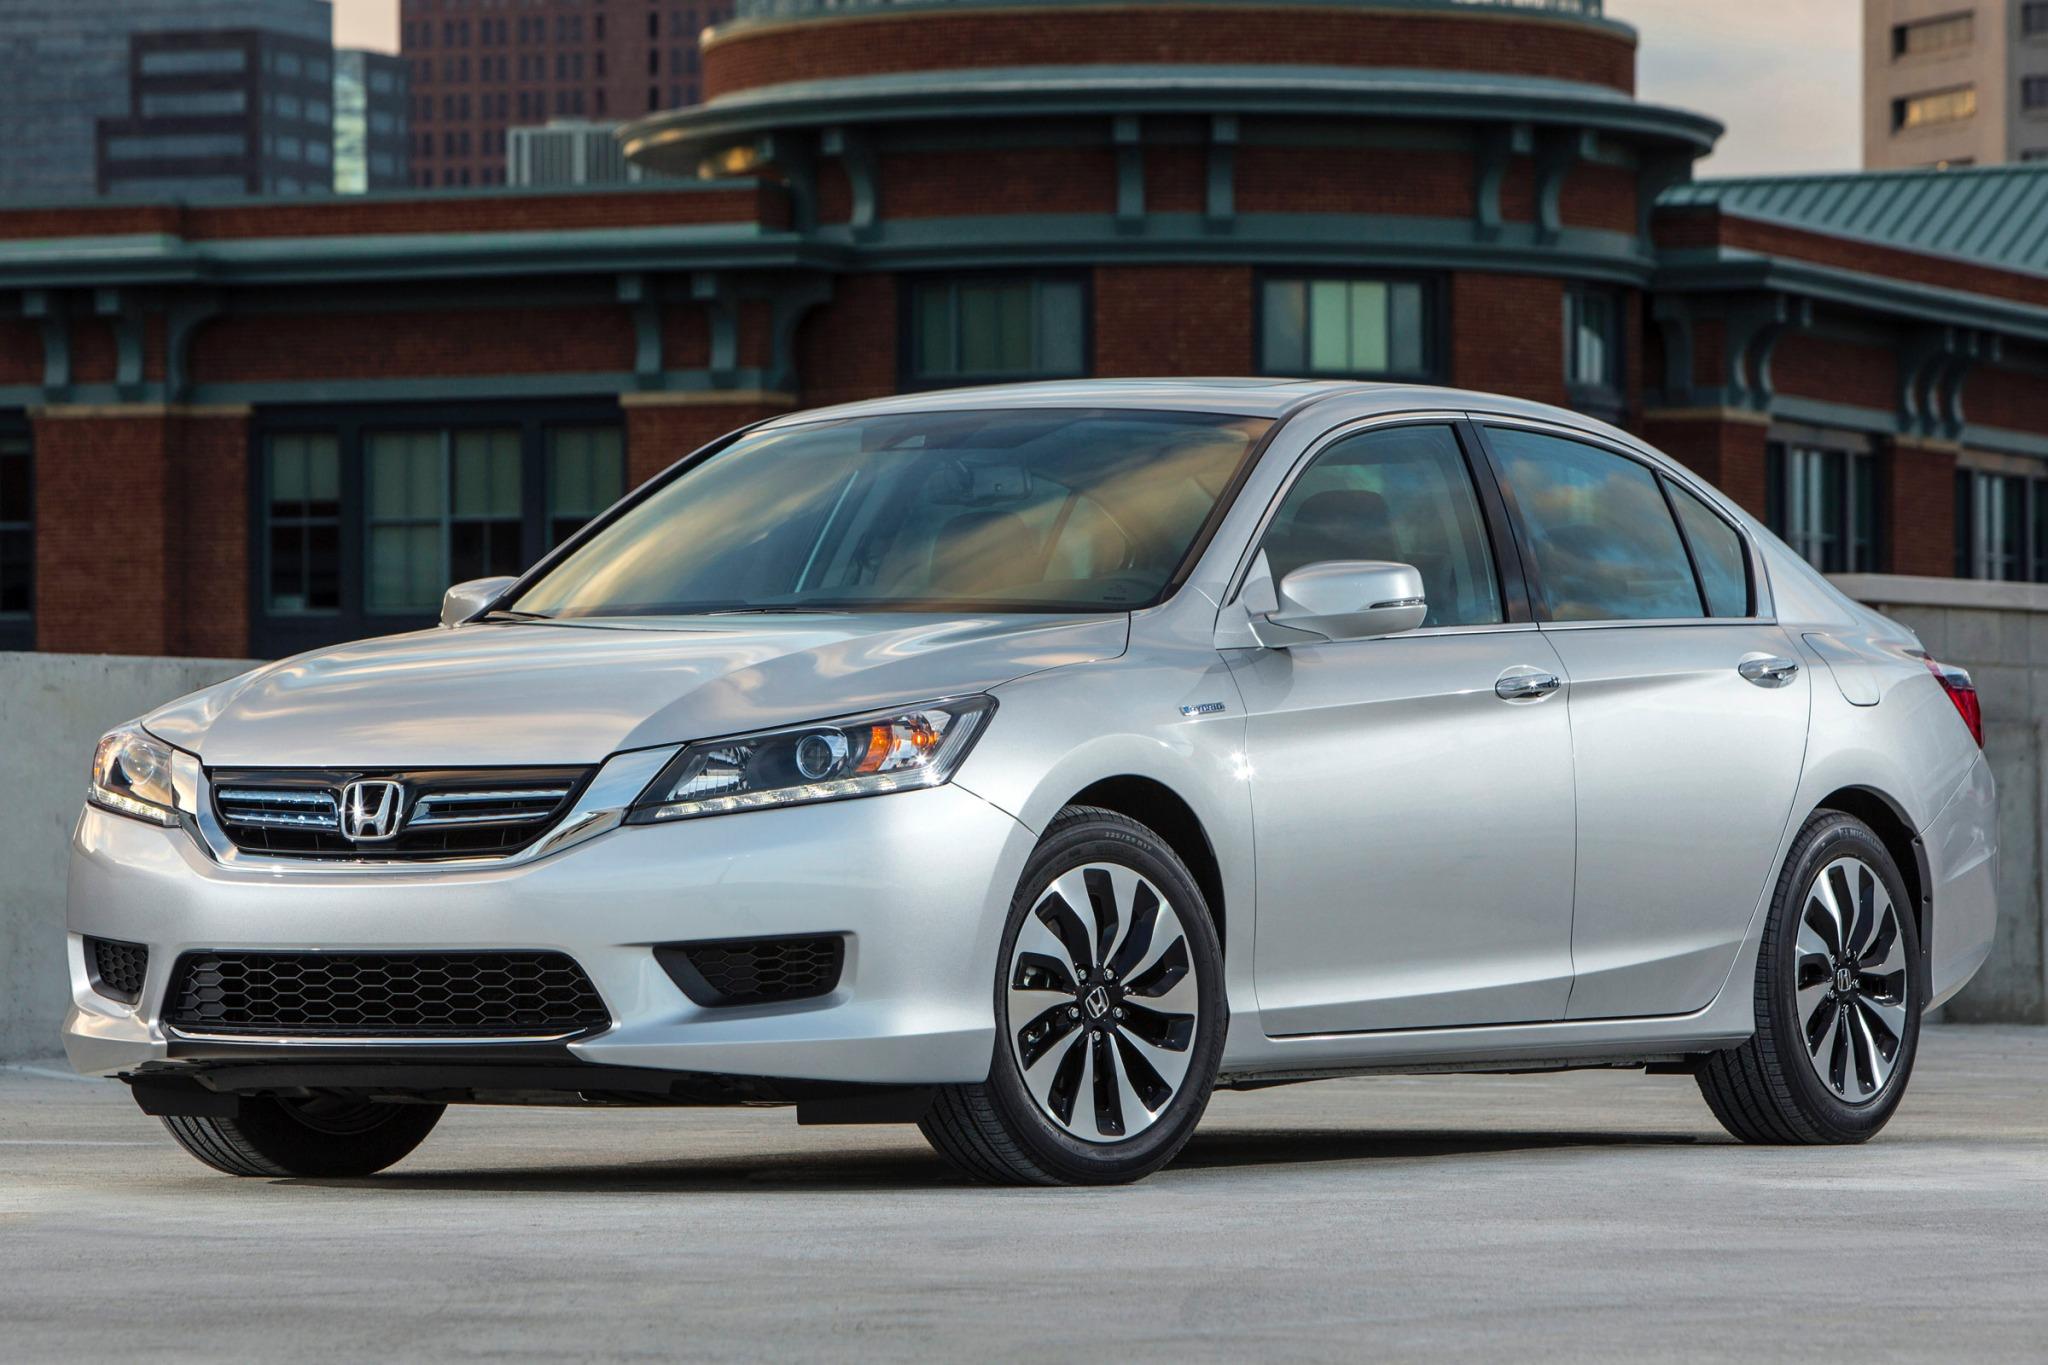 2014 Honda Accord Hybrid Image 1